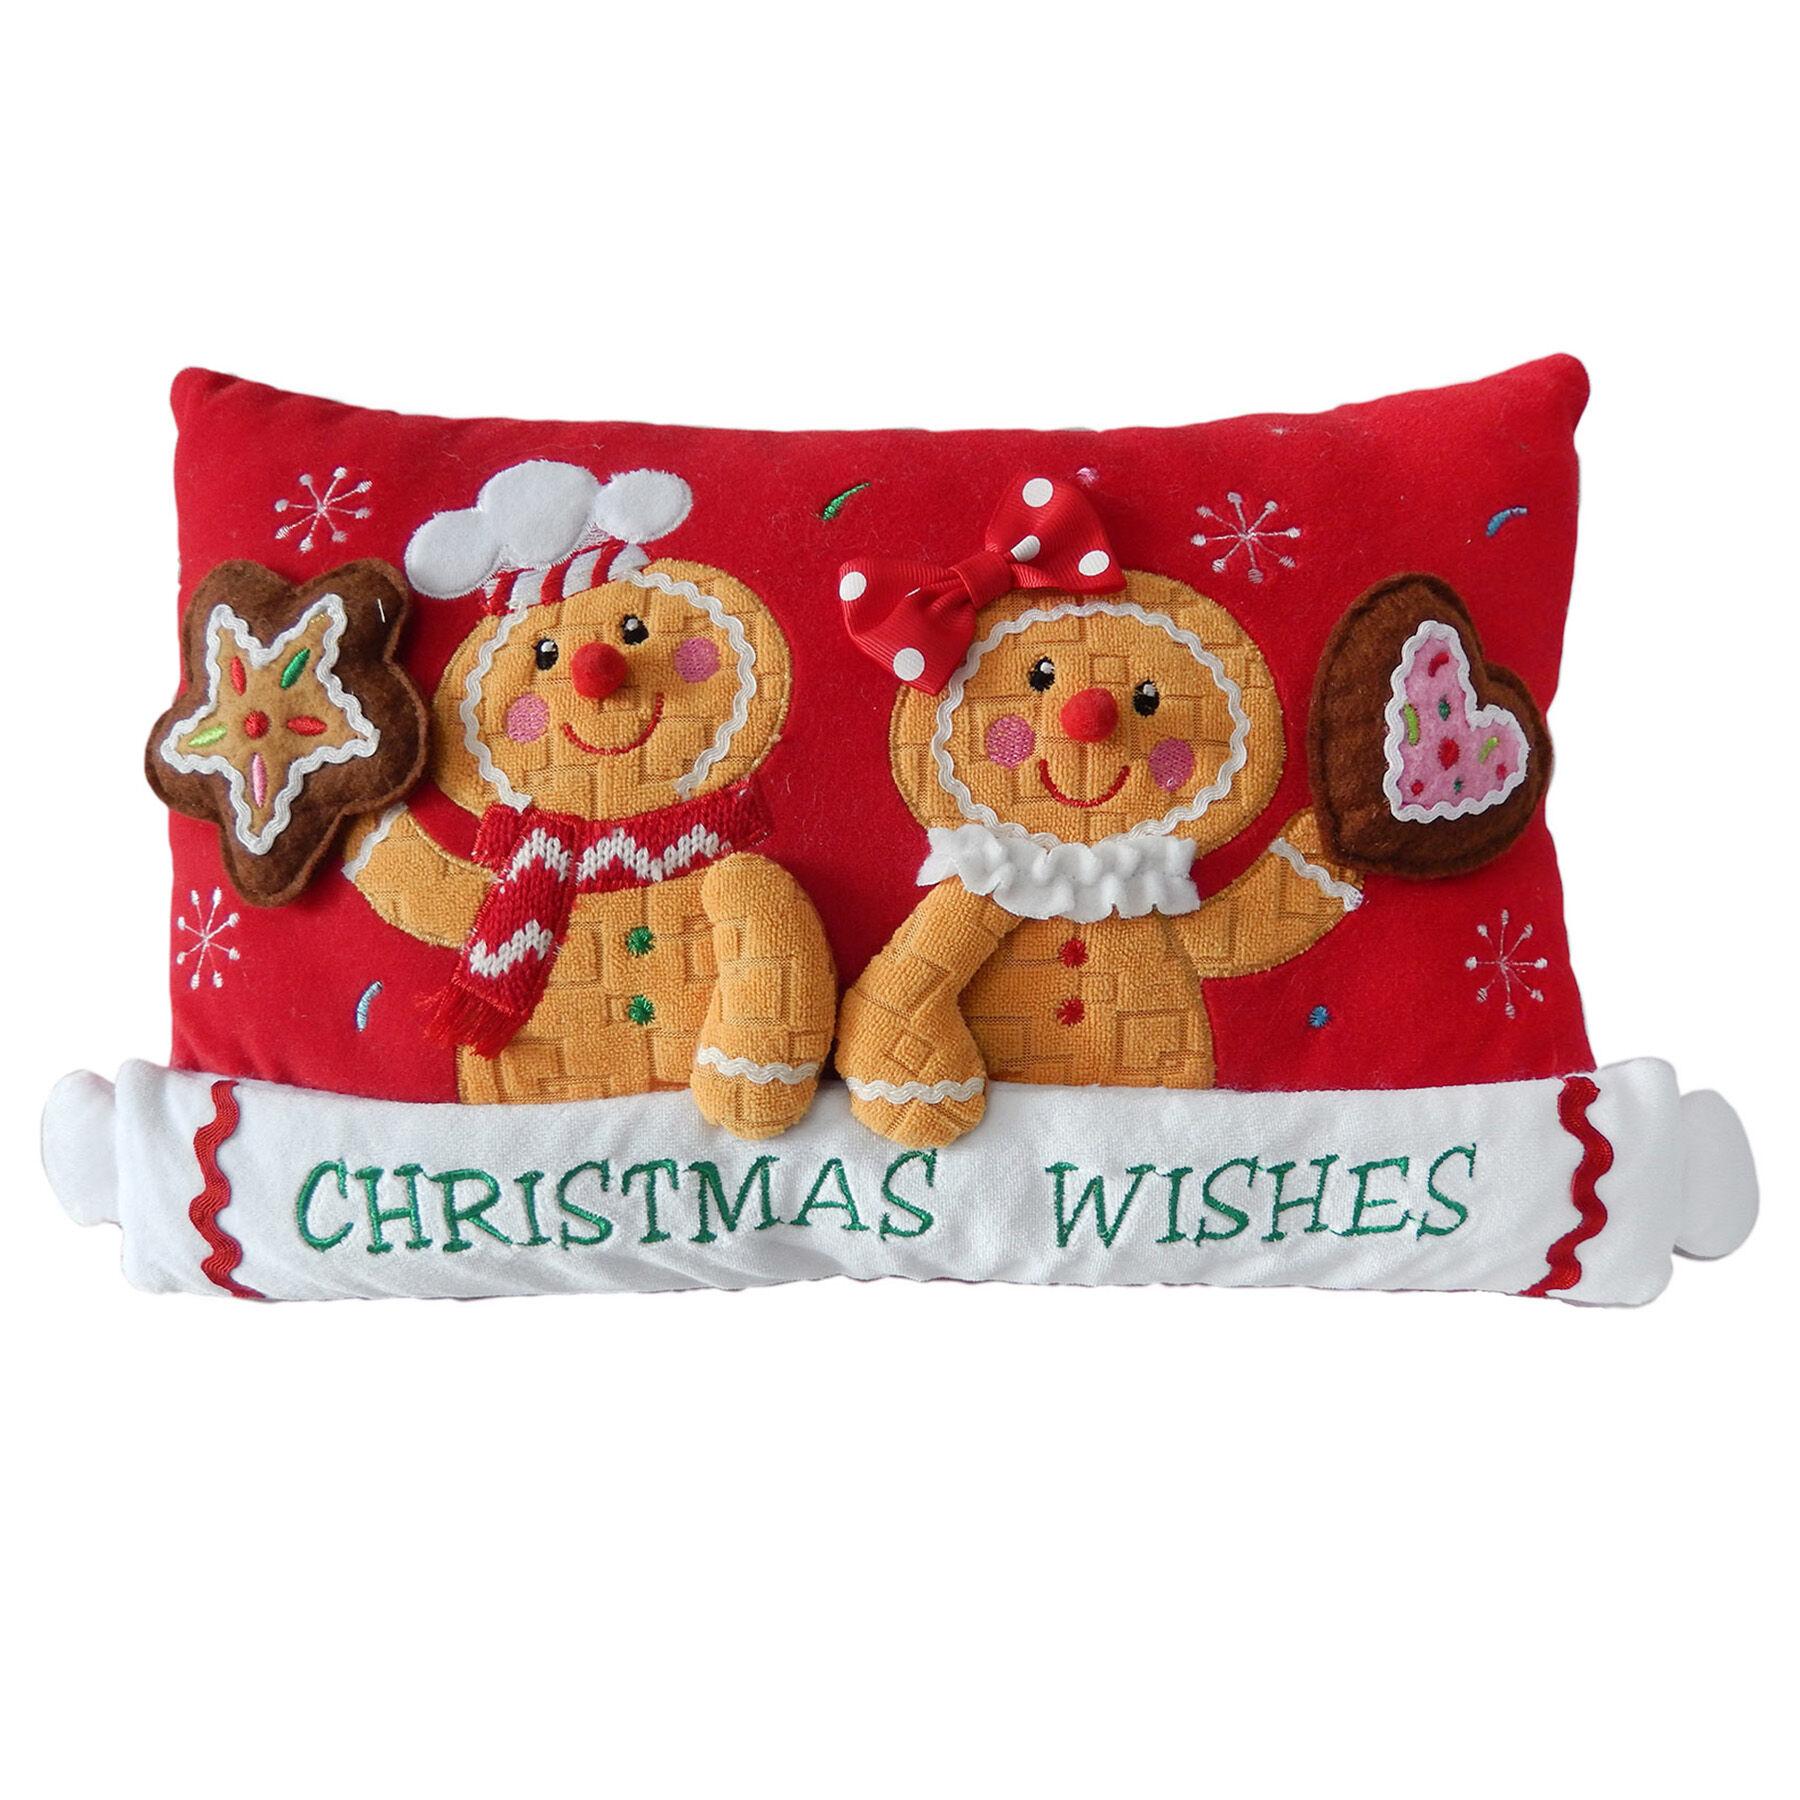 Decorative Pillows For Christmas